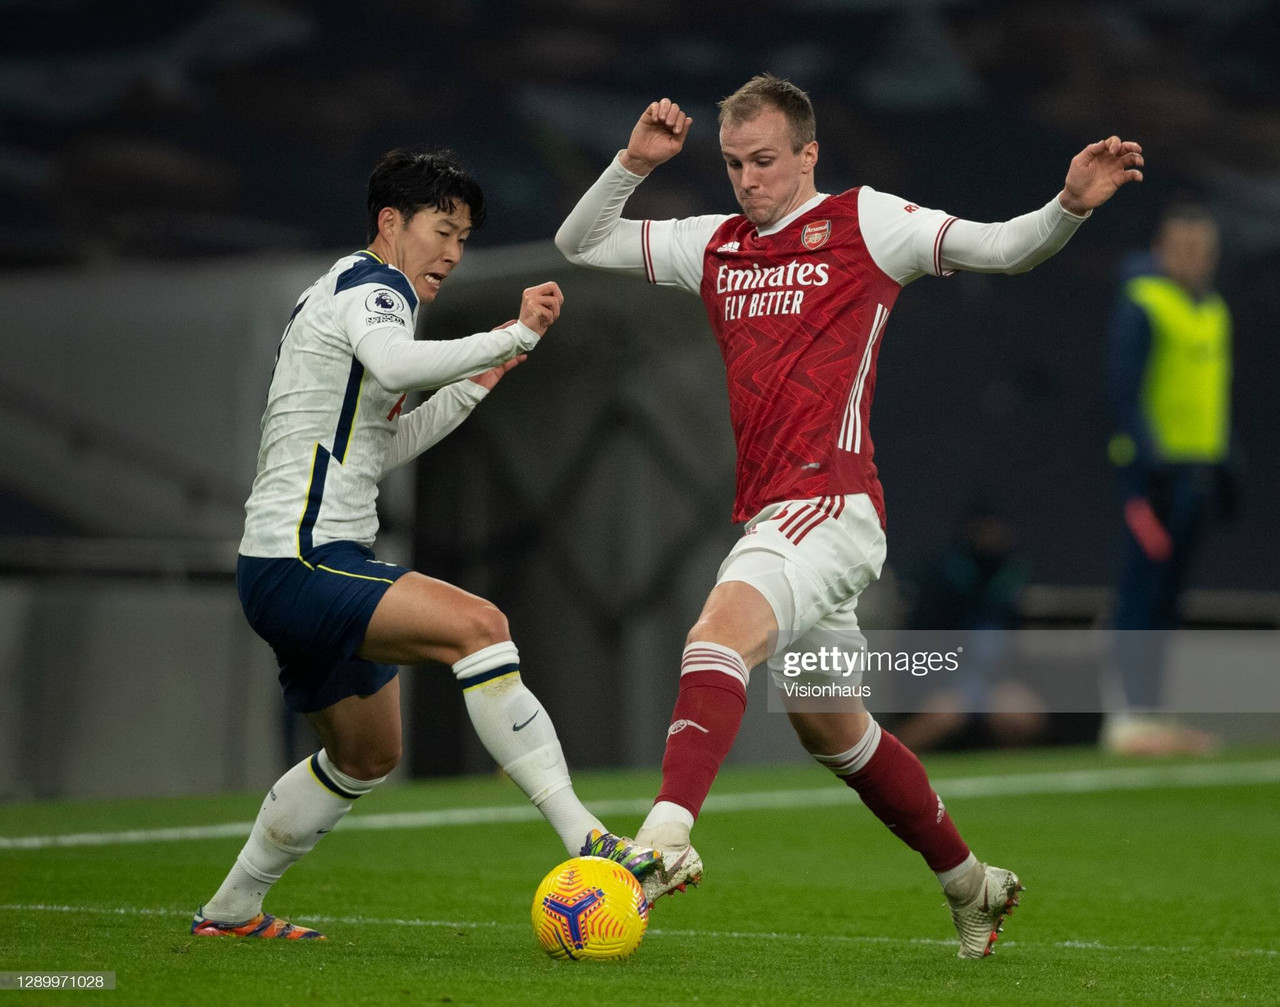 Arsenal vs Tottenham Hotspur: Five memorable North London Derbys